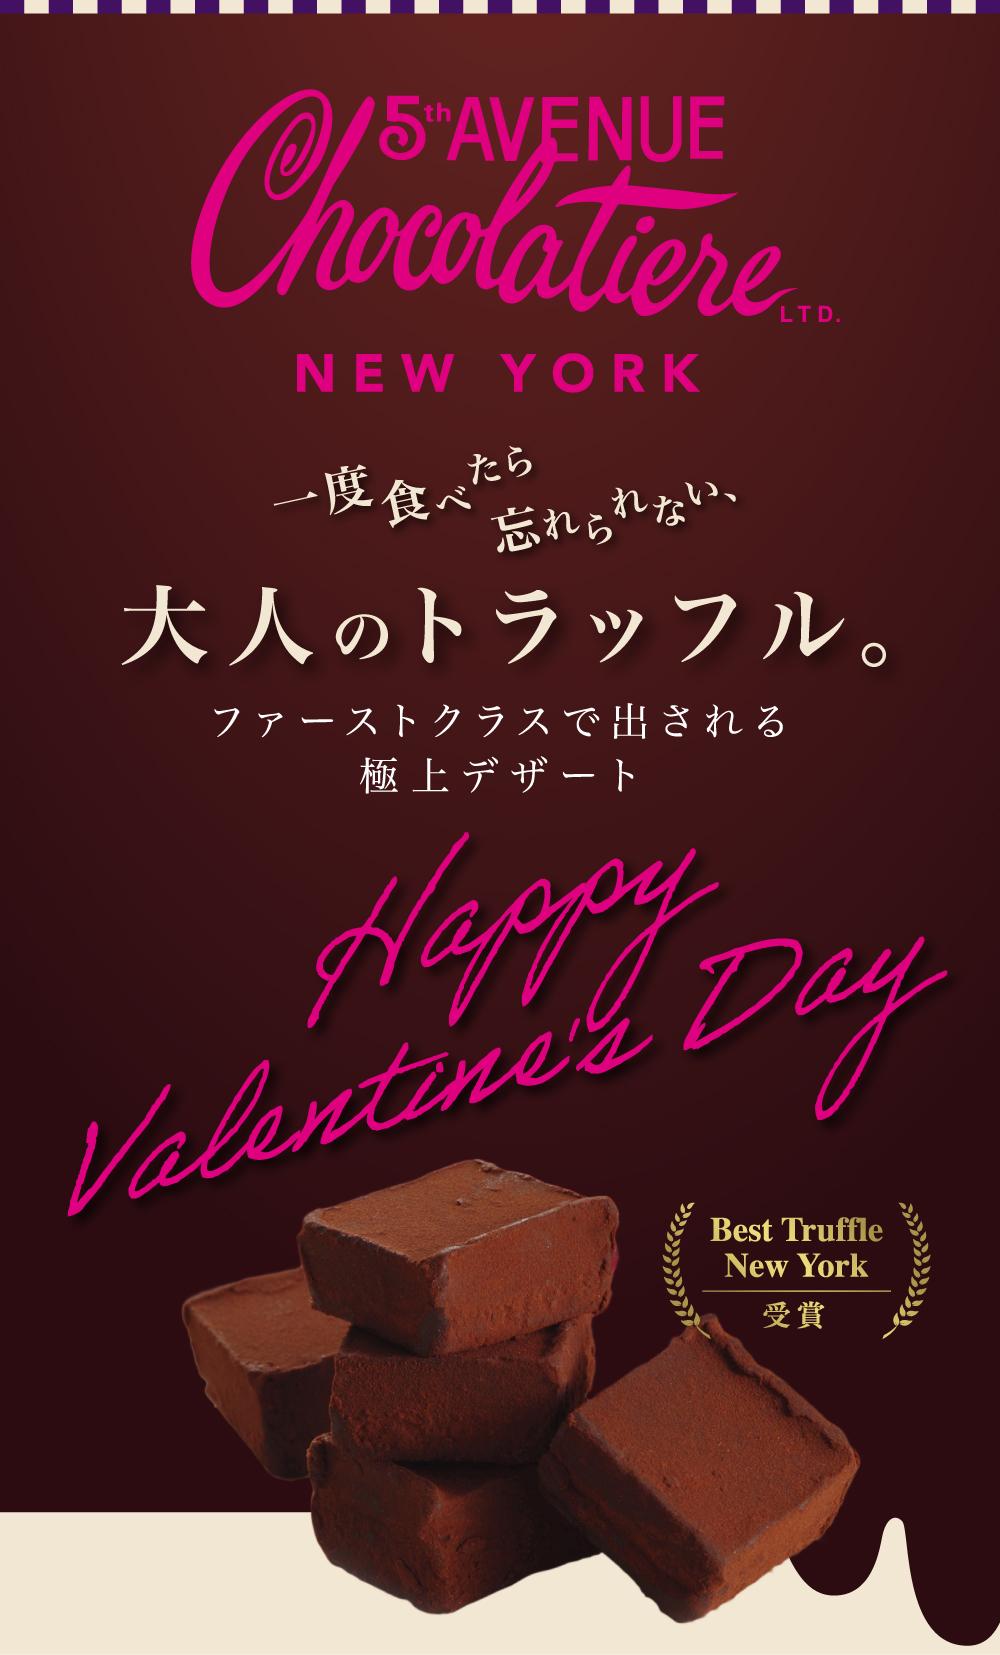 5th Avenue Chocolatiere New York 一度食べたら忘れられない大人のトラッフル。ファーストクラスで出される極上デザート。